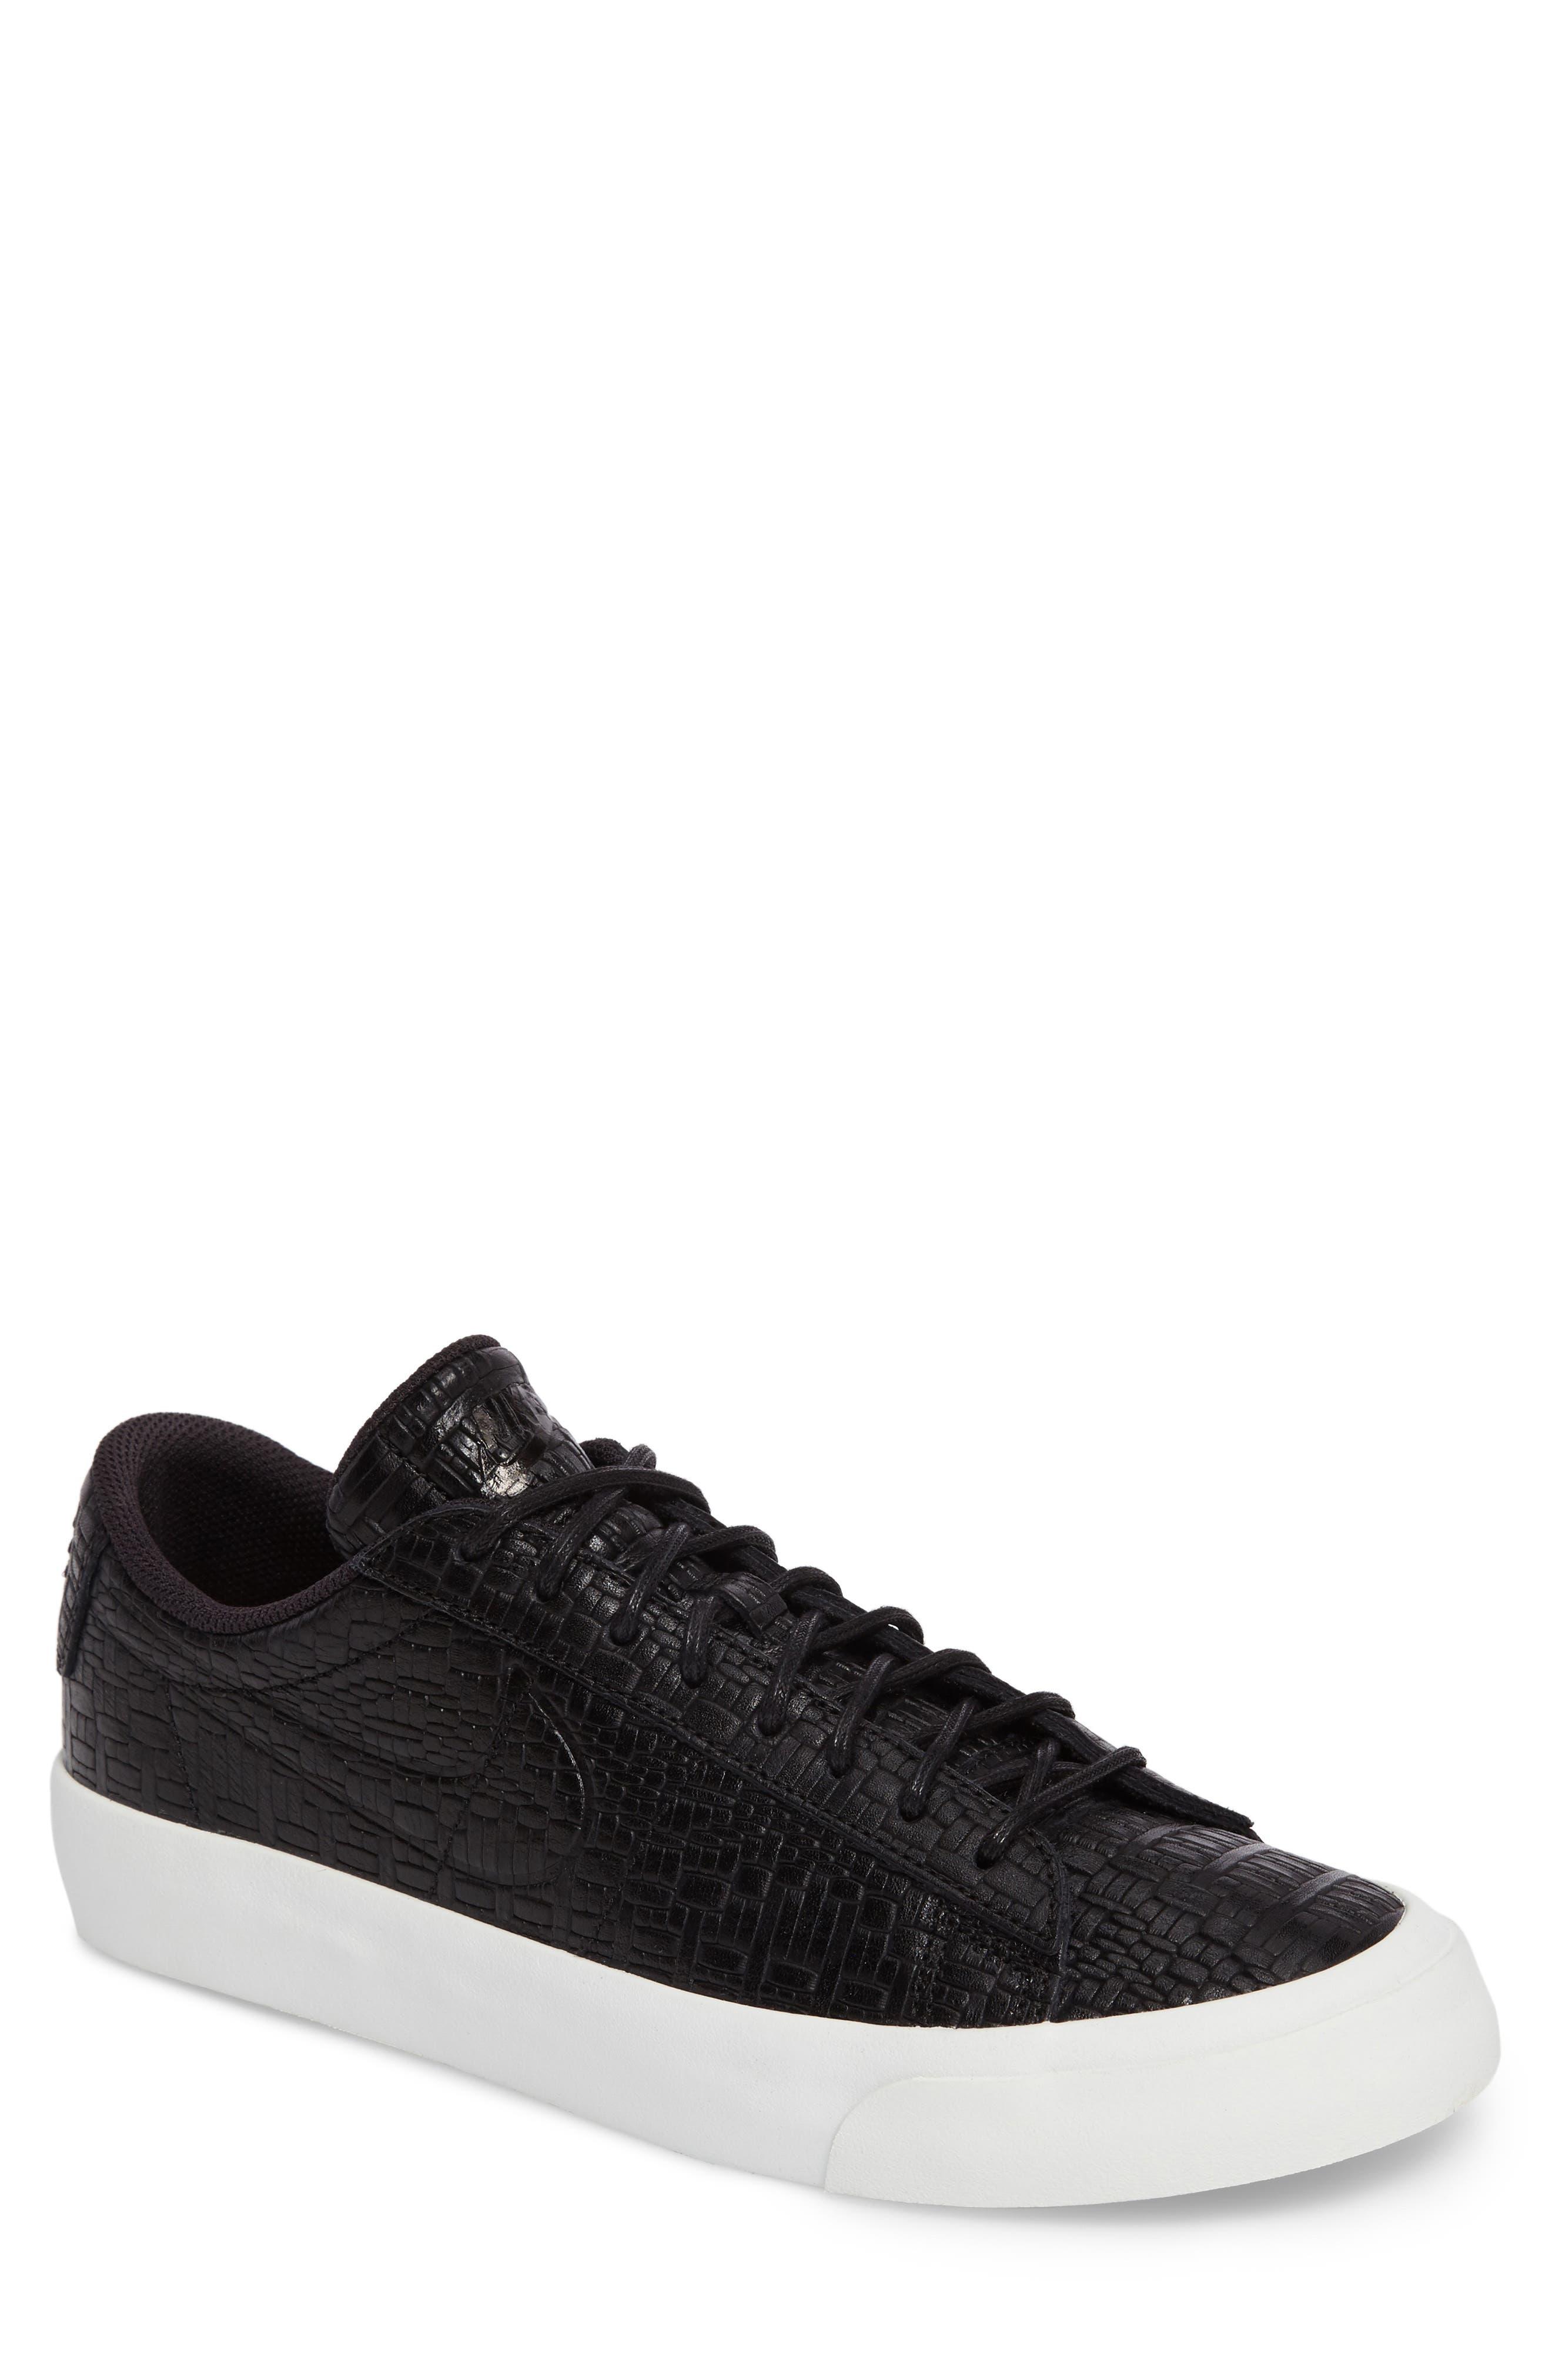 Blazer Studio Sneaker,                             Main thumbnail 1, color,                             001